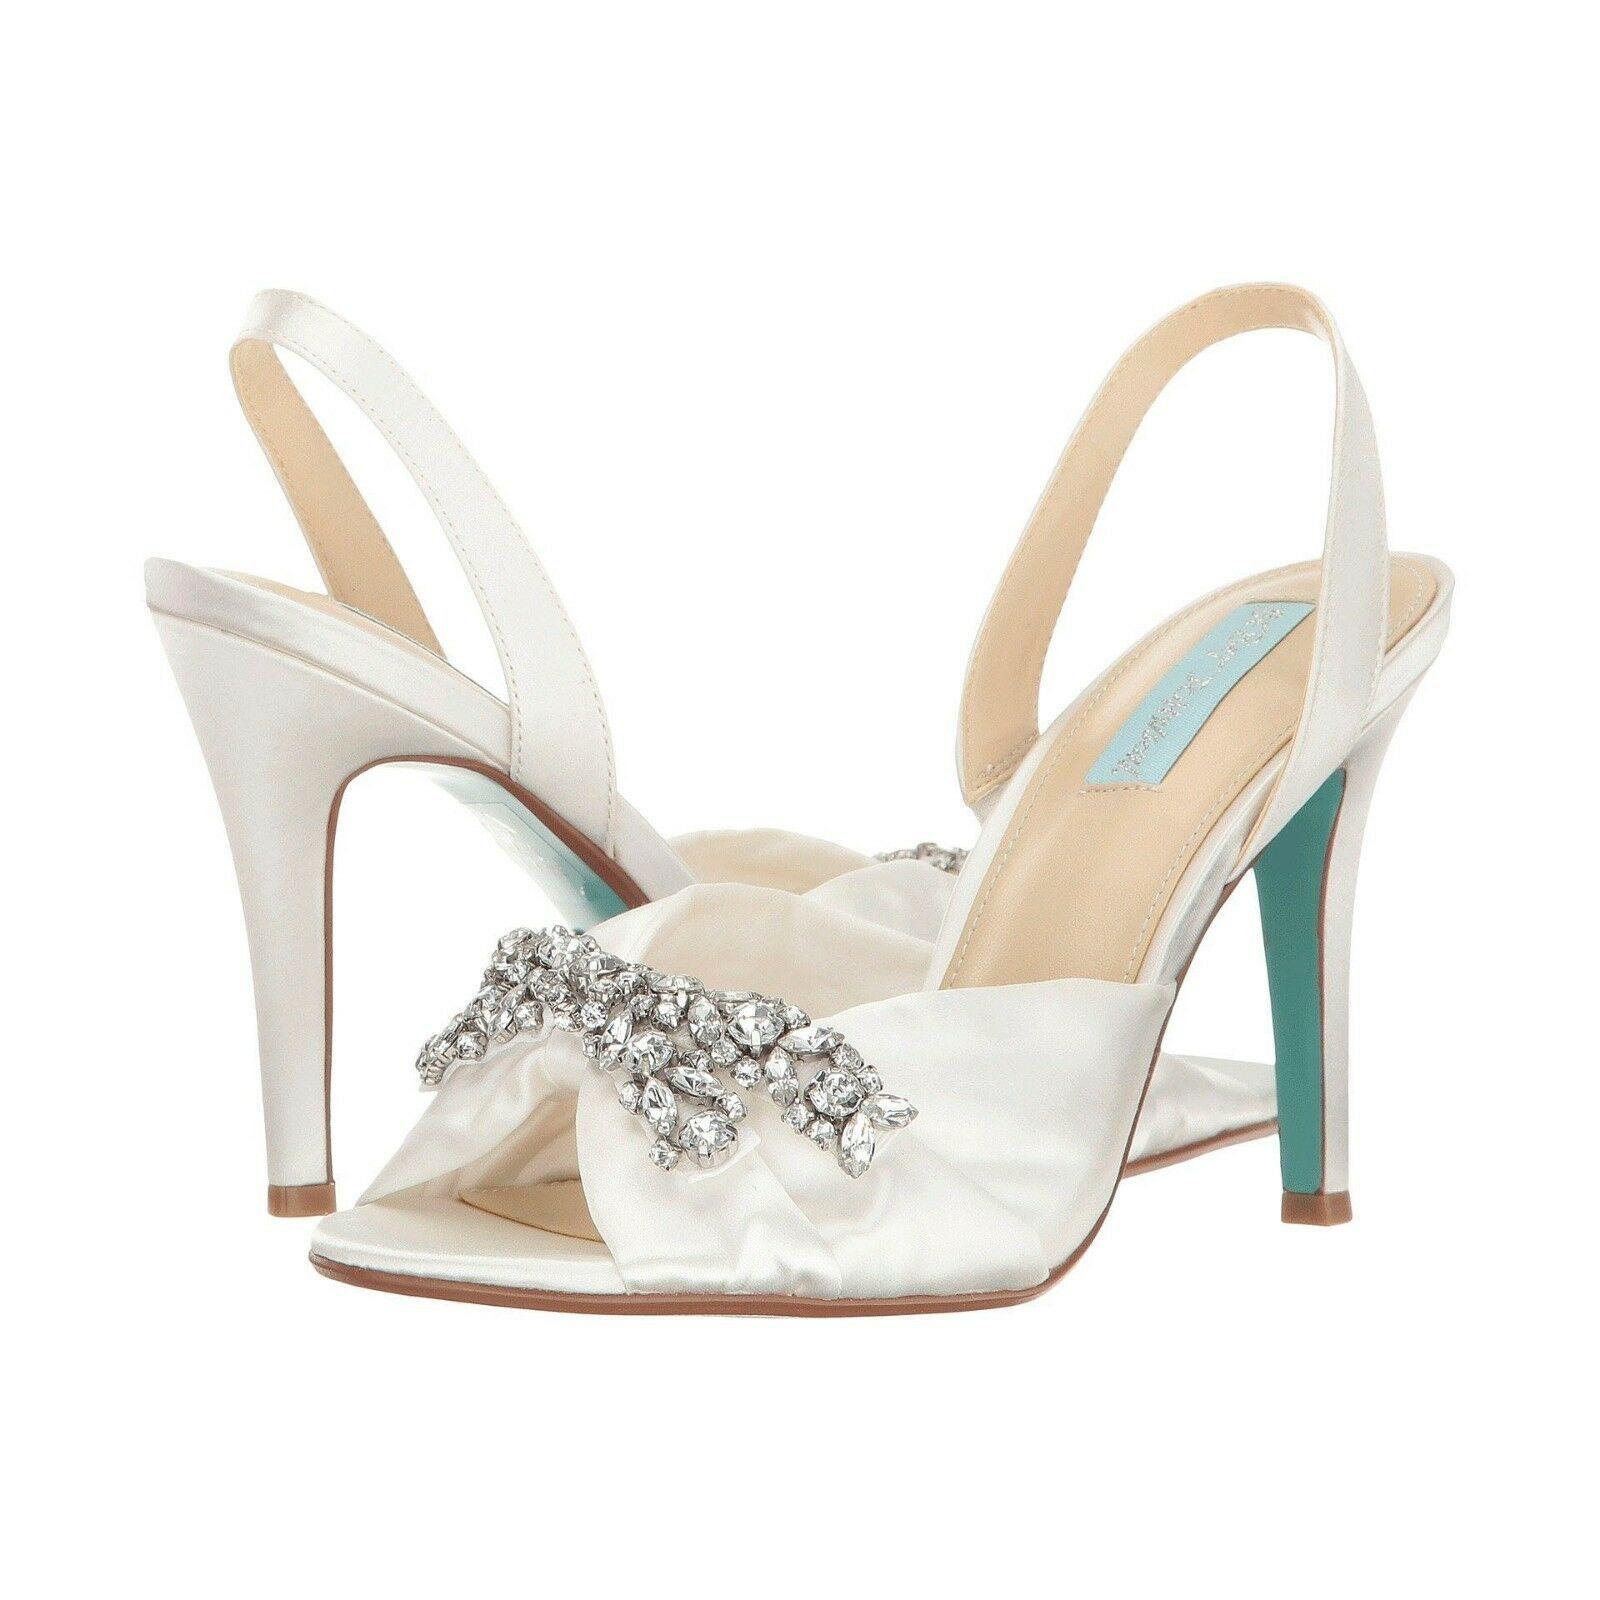 Betsey Johnson Briel Ivory Satin Crystal Wedding Heel Pumps Sandals 7.5 - $83.66